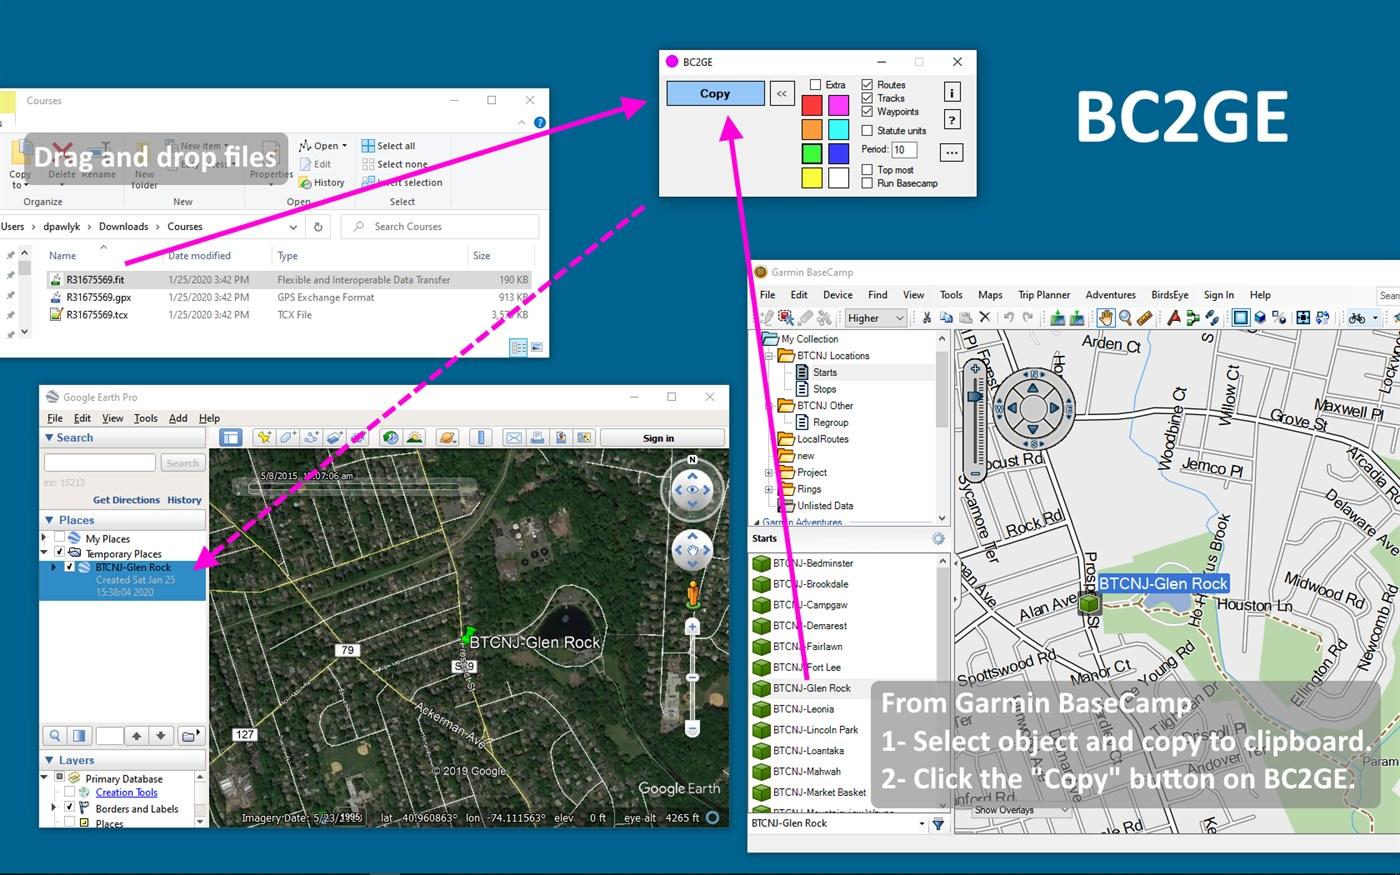 BC2GE - da BaseCamp a Google Earth